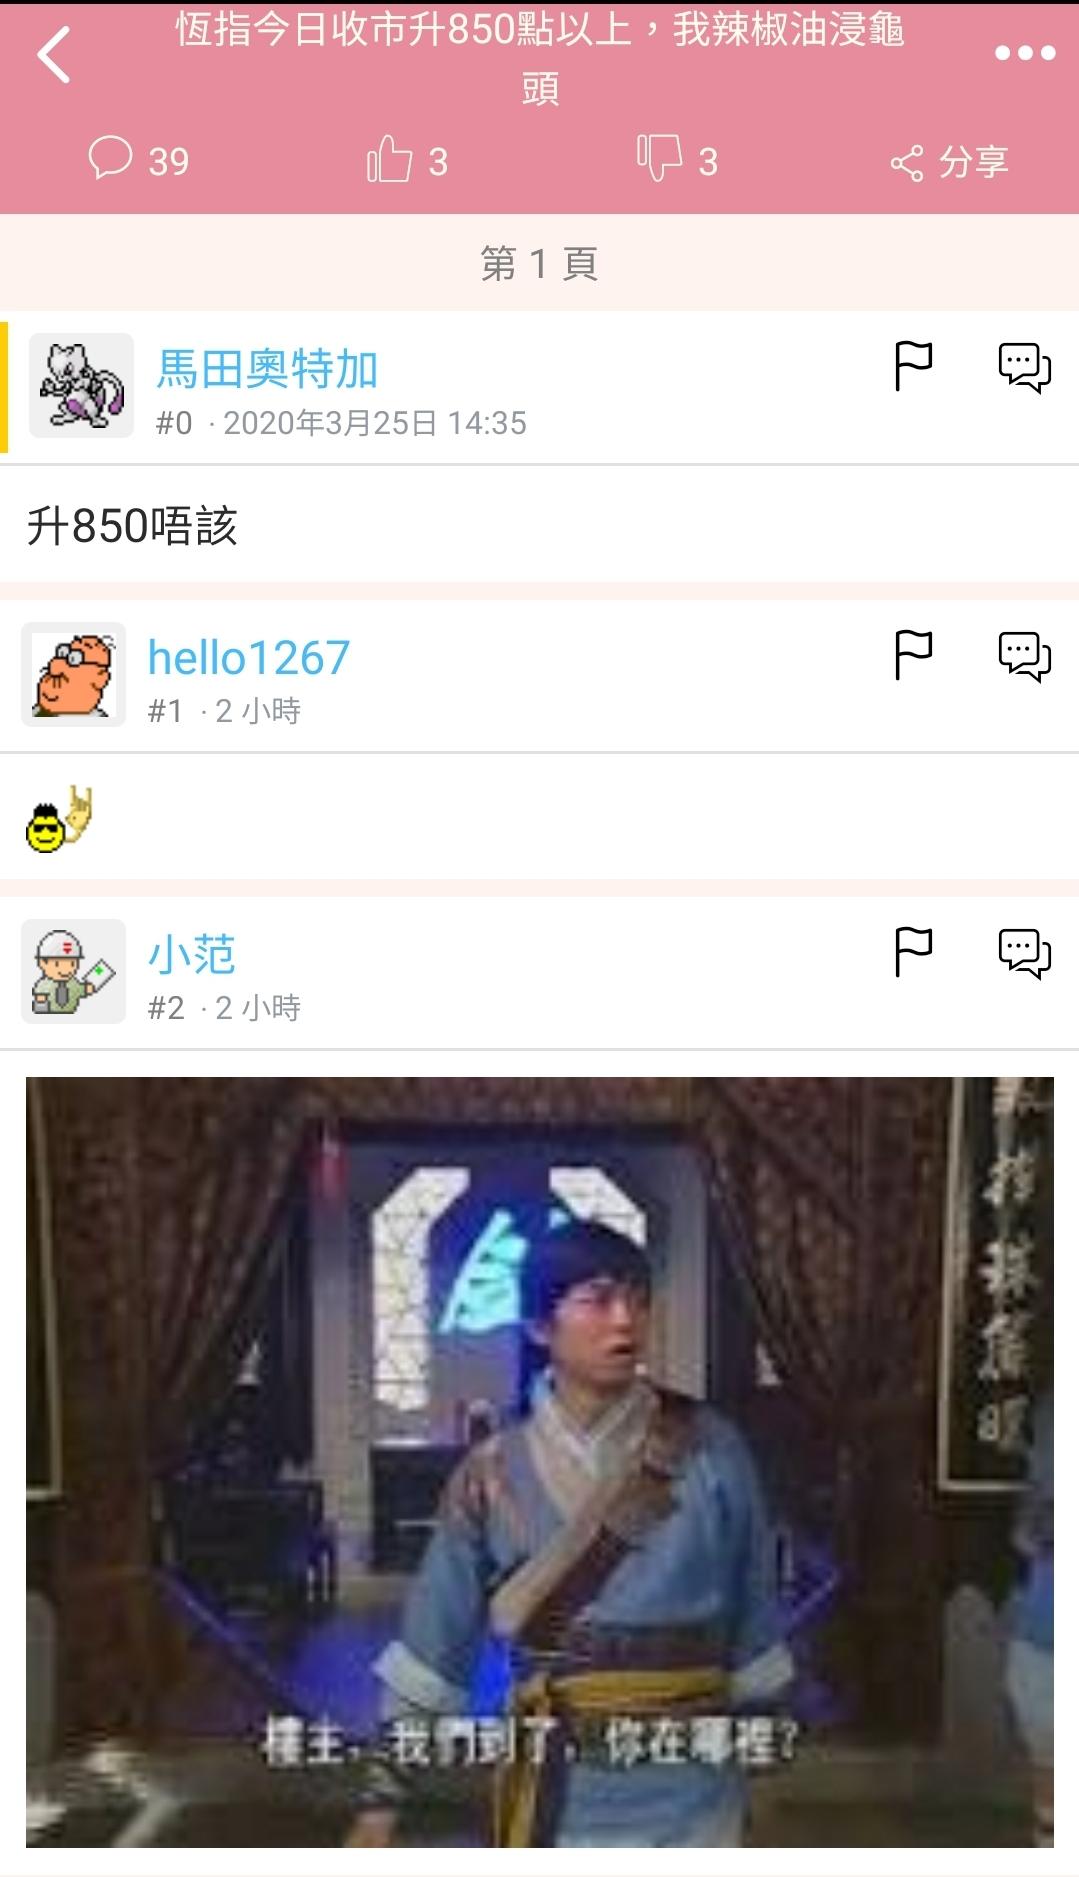 https://upload.cc/i1/2020/03/26/E1rzp2.png